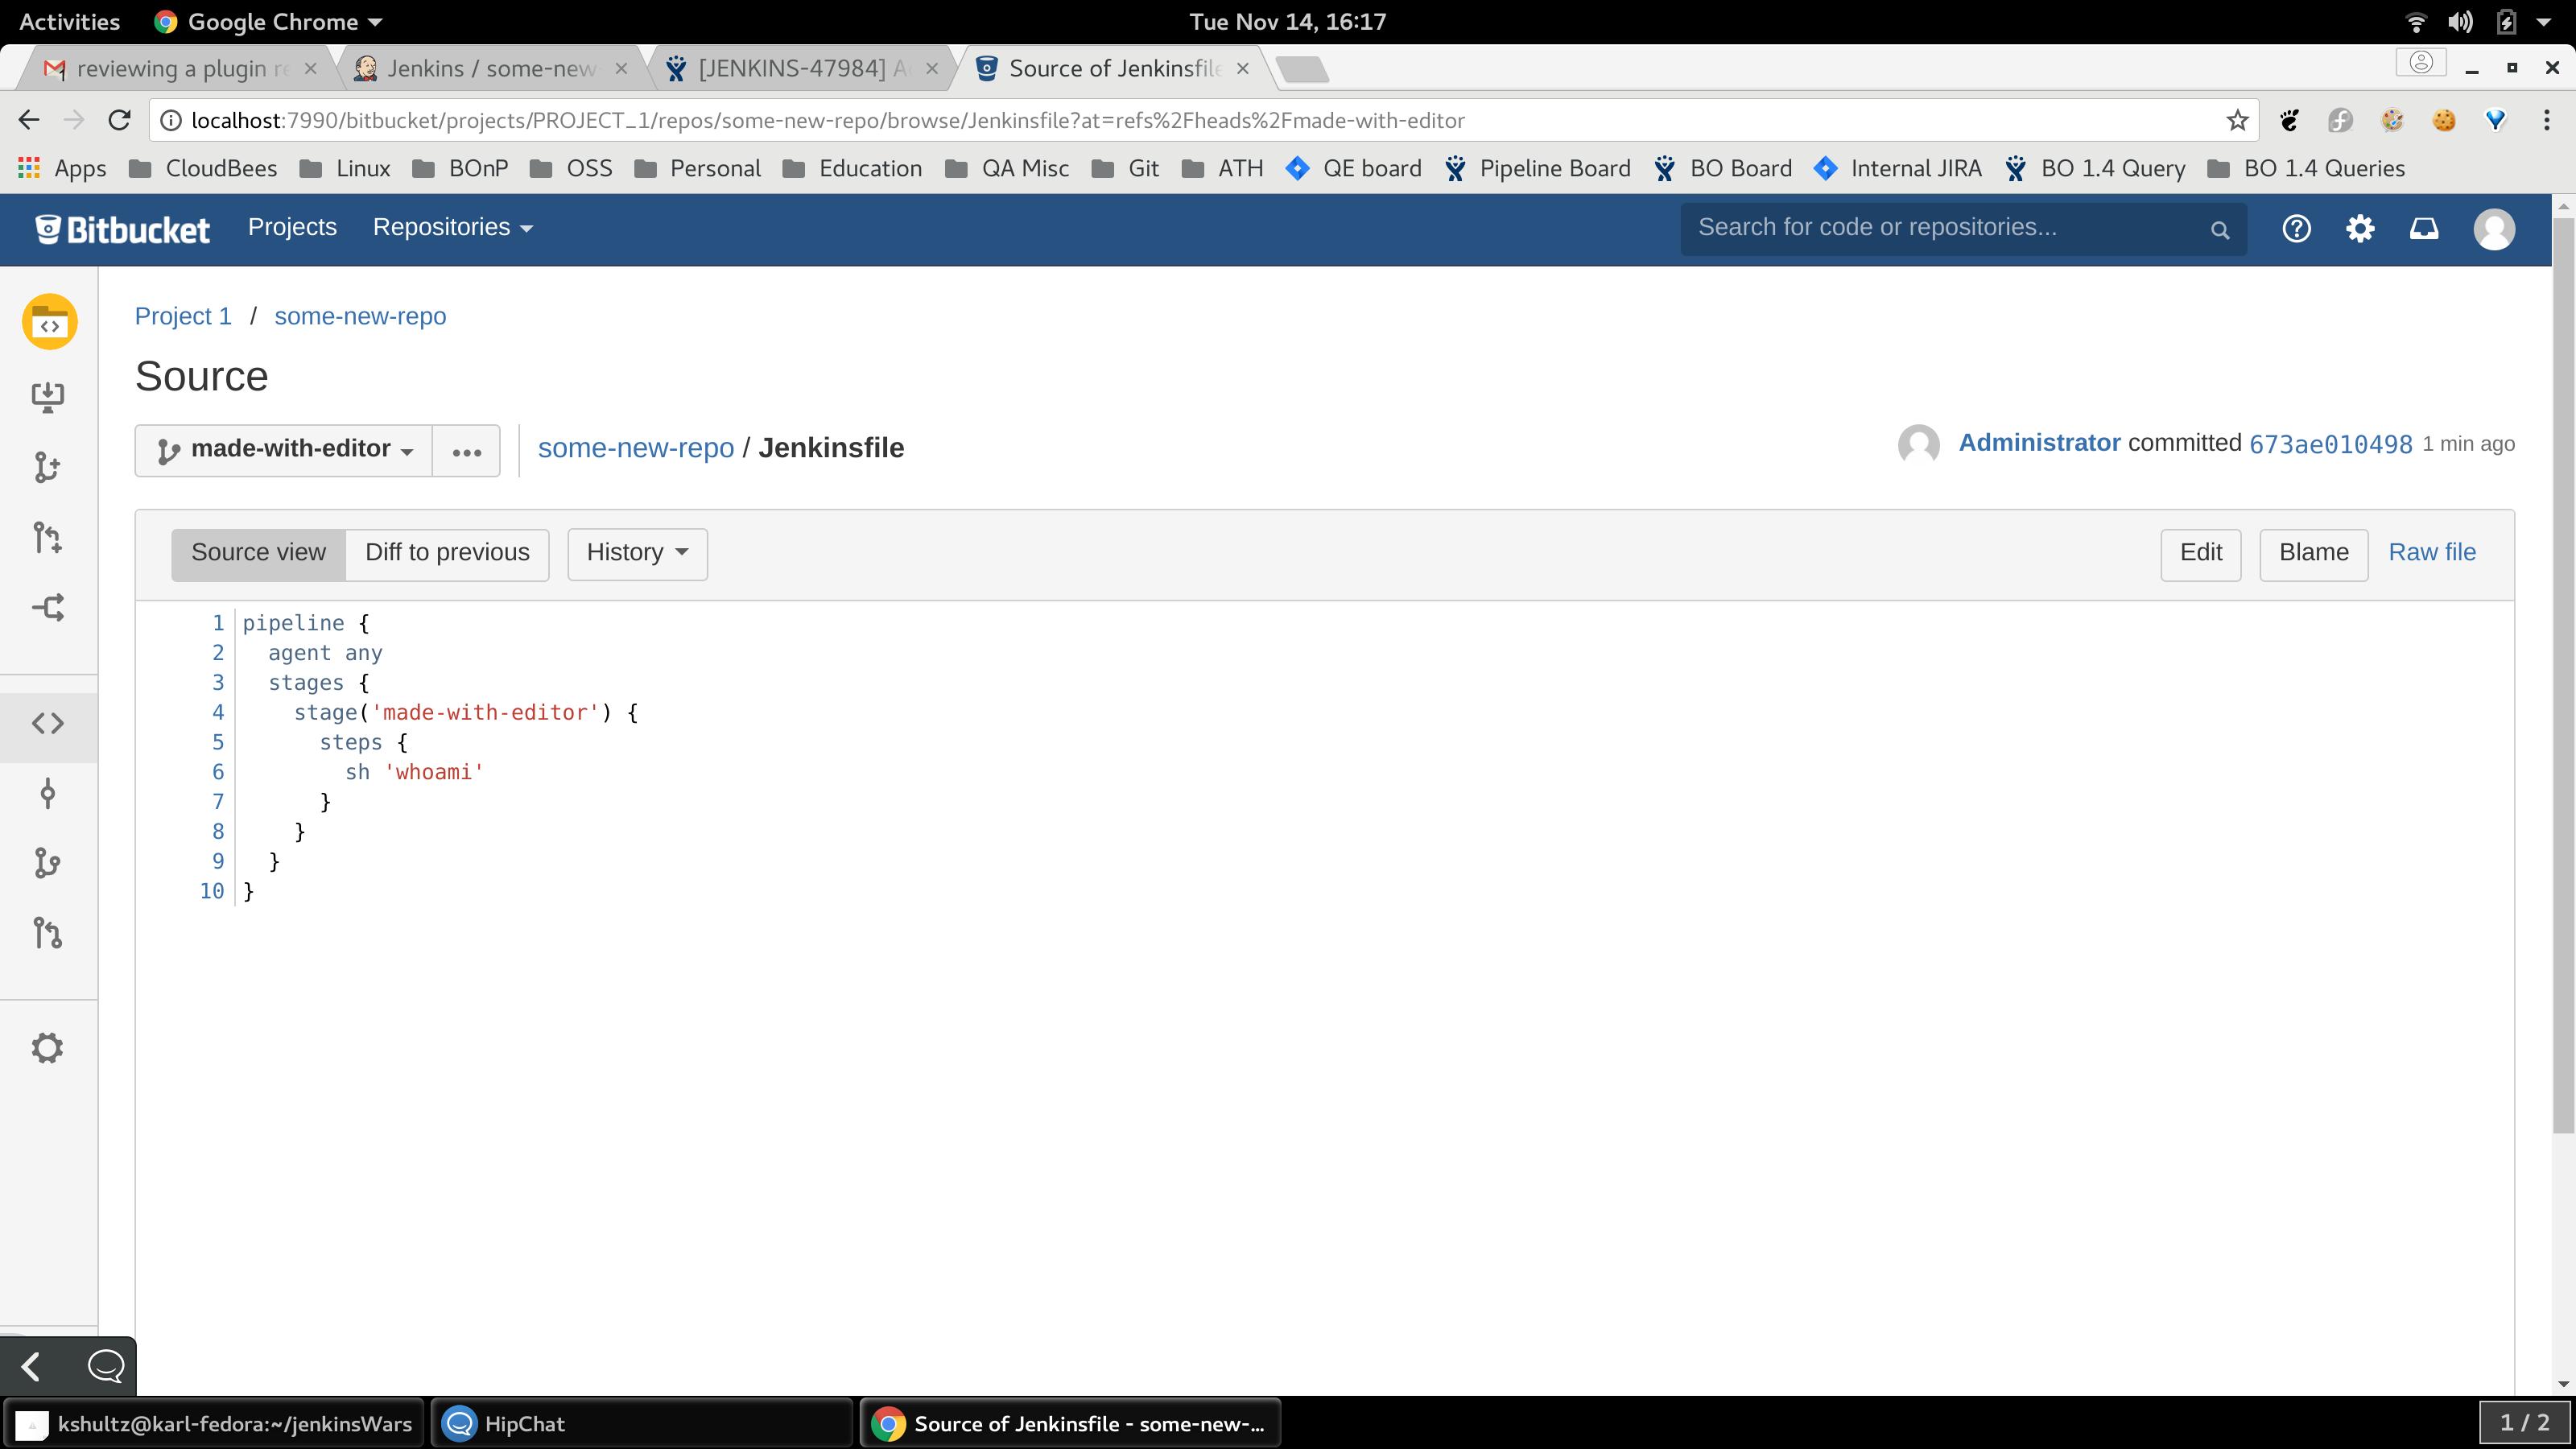 JENKINS-47984] Adding Bitbucket server with http instead of